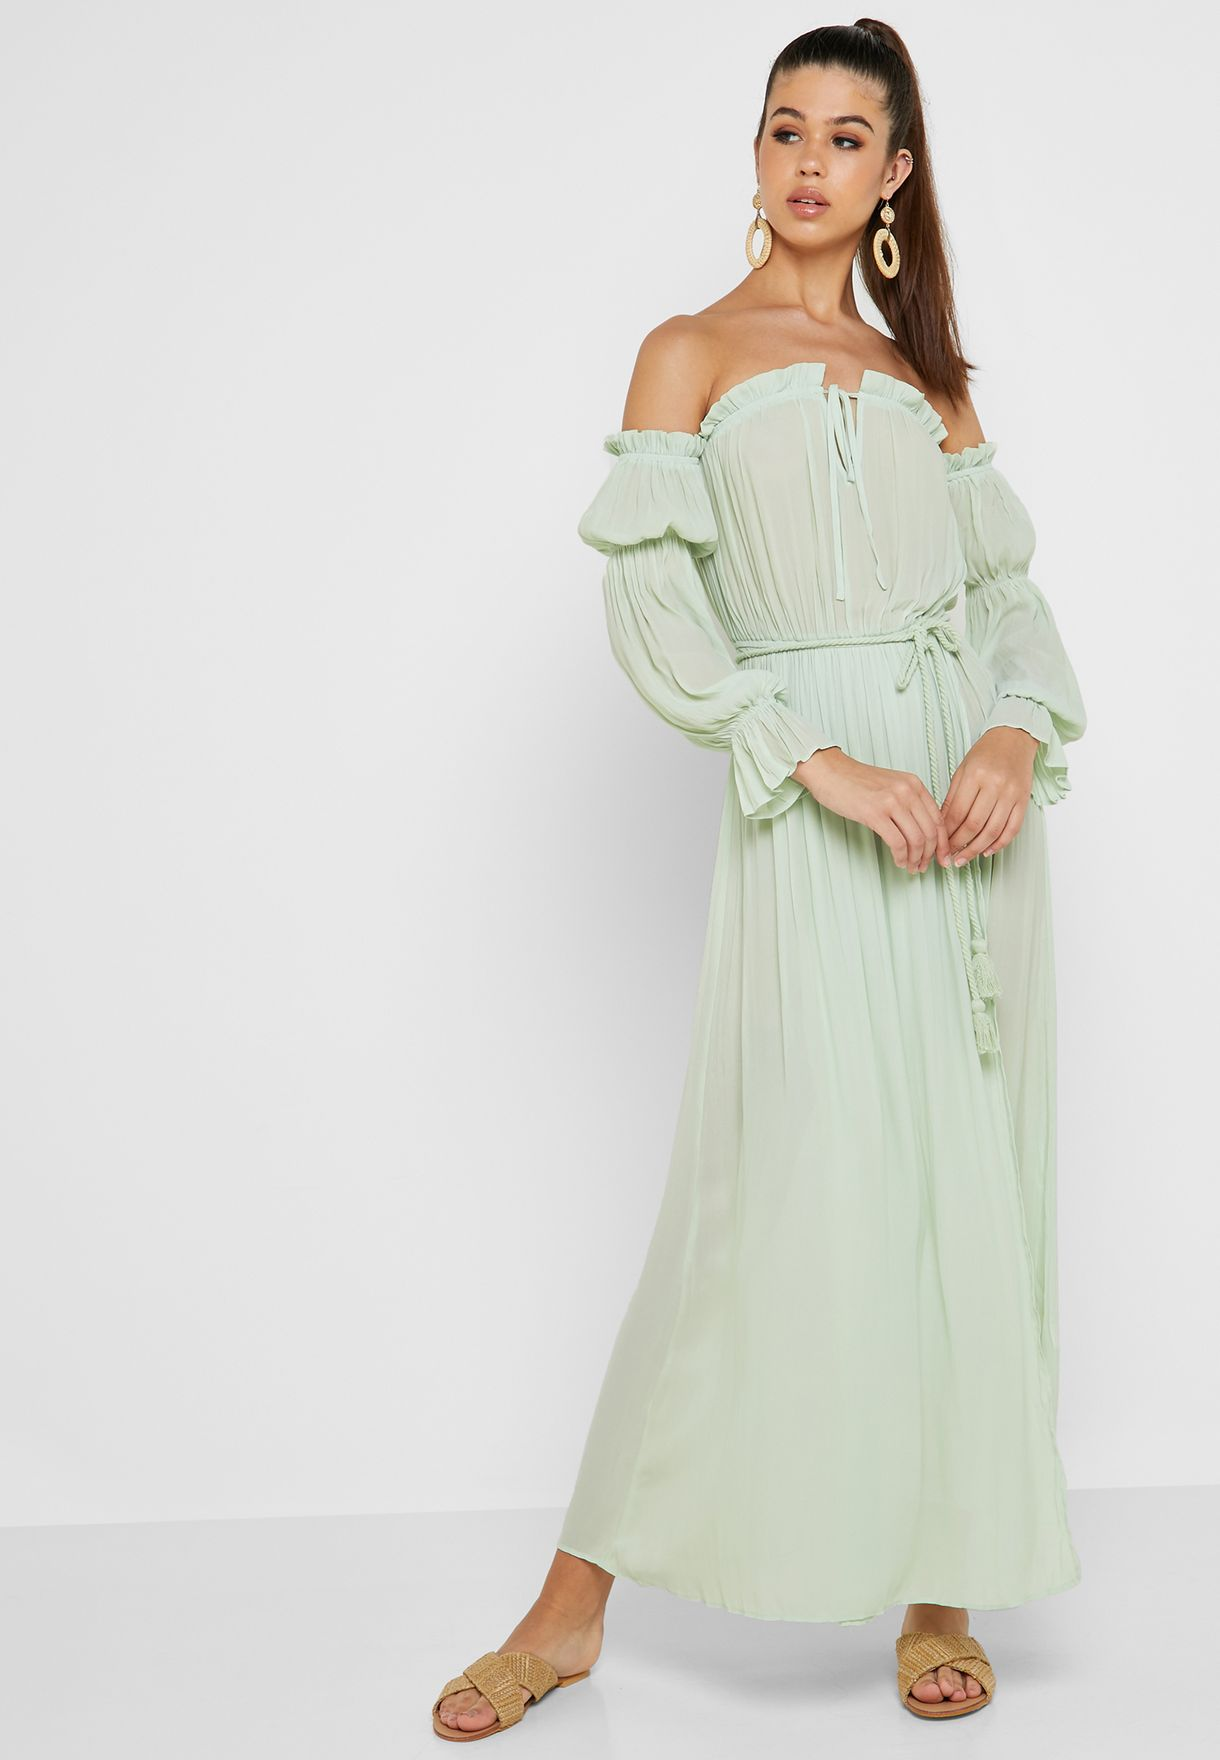 388f7b097f42 Shop Forever 21 green Ruffle Detail Bardot Maxi Dress 341371 for ...